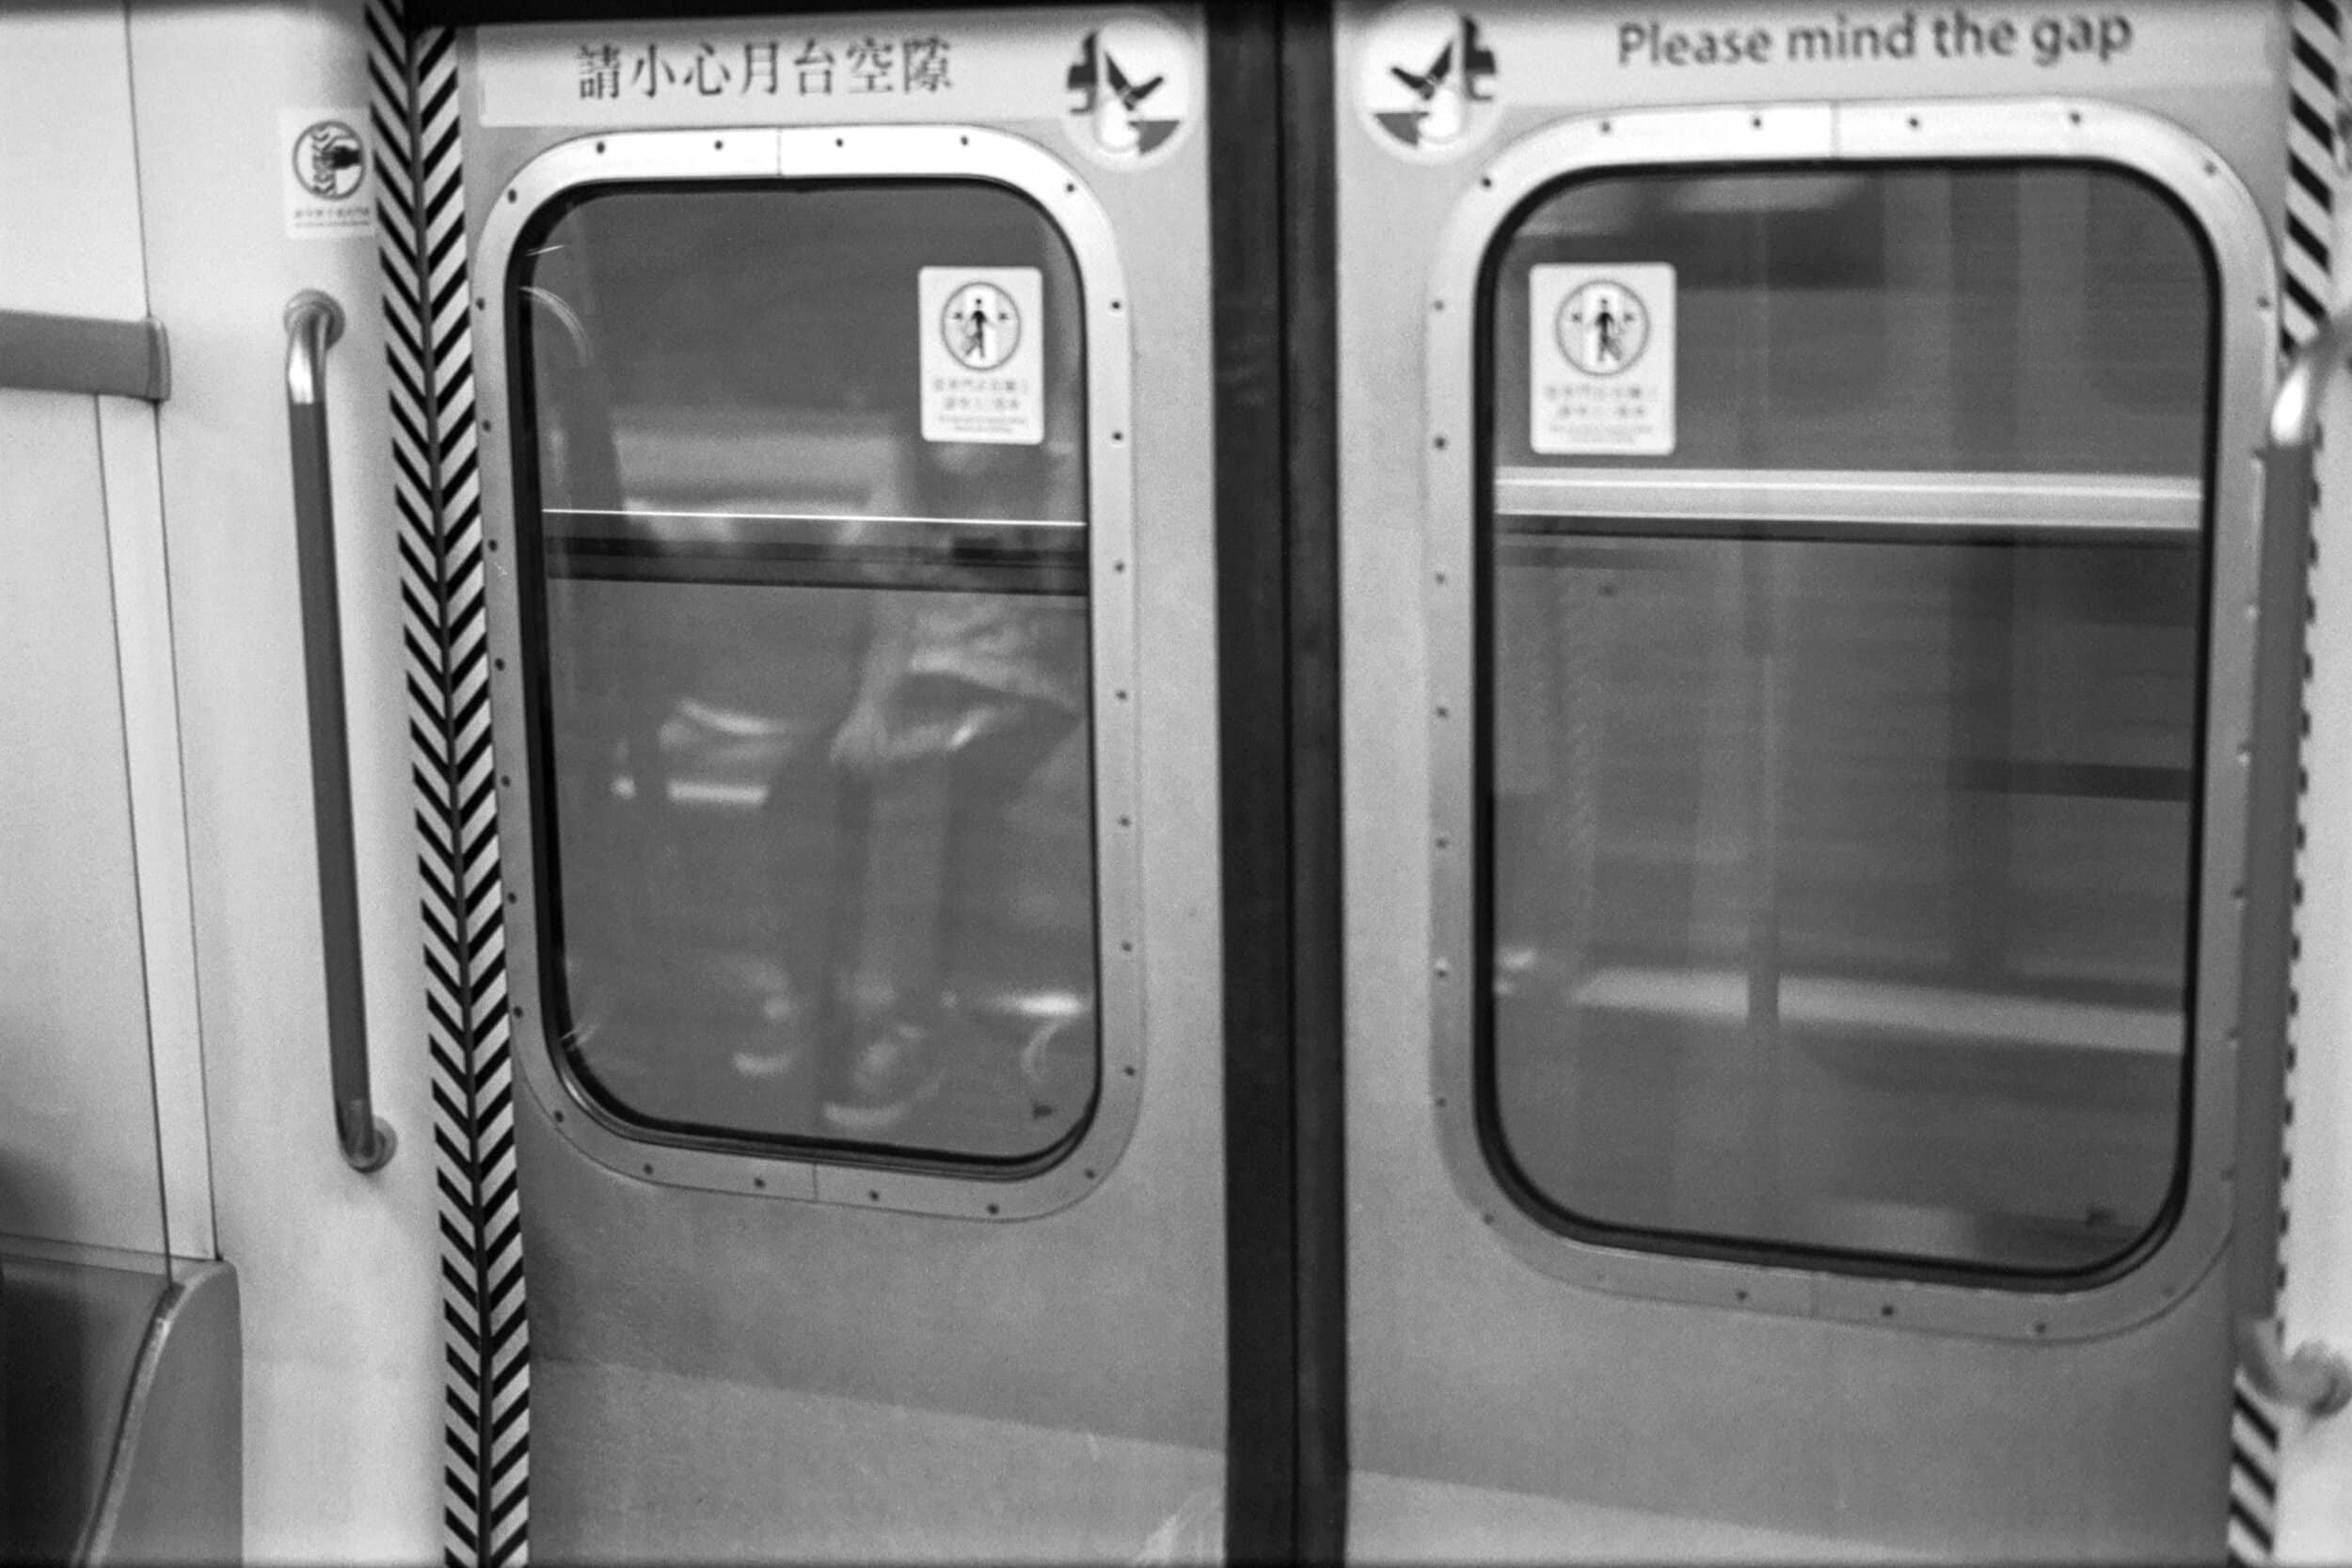 Hong-Kong-Subway-Horatio-Tan-metox